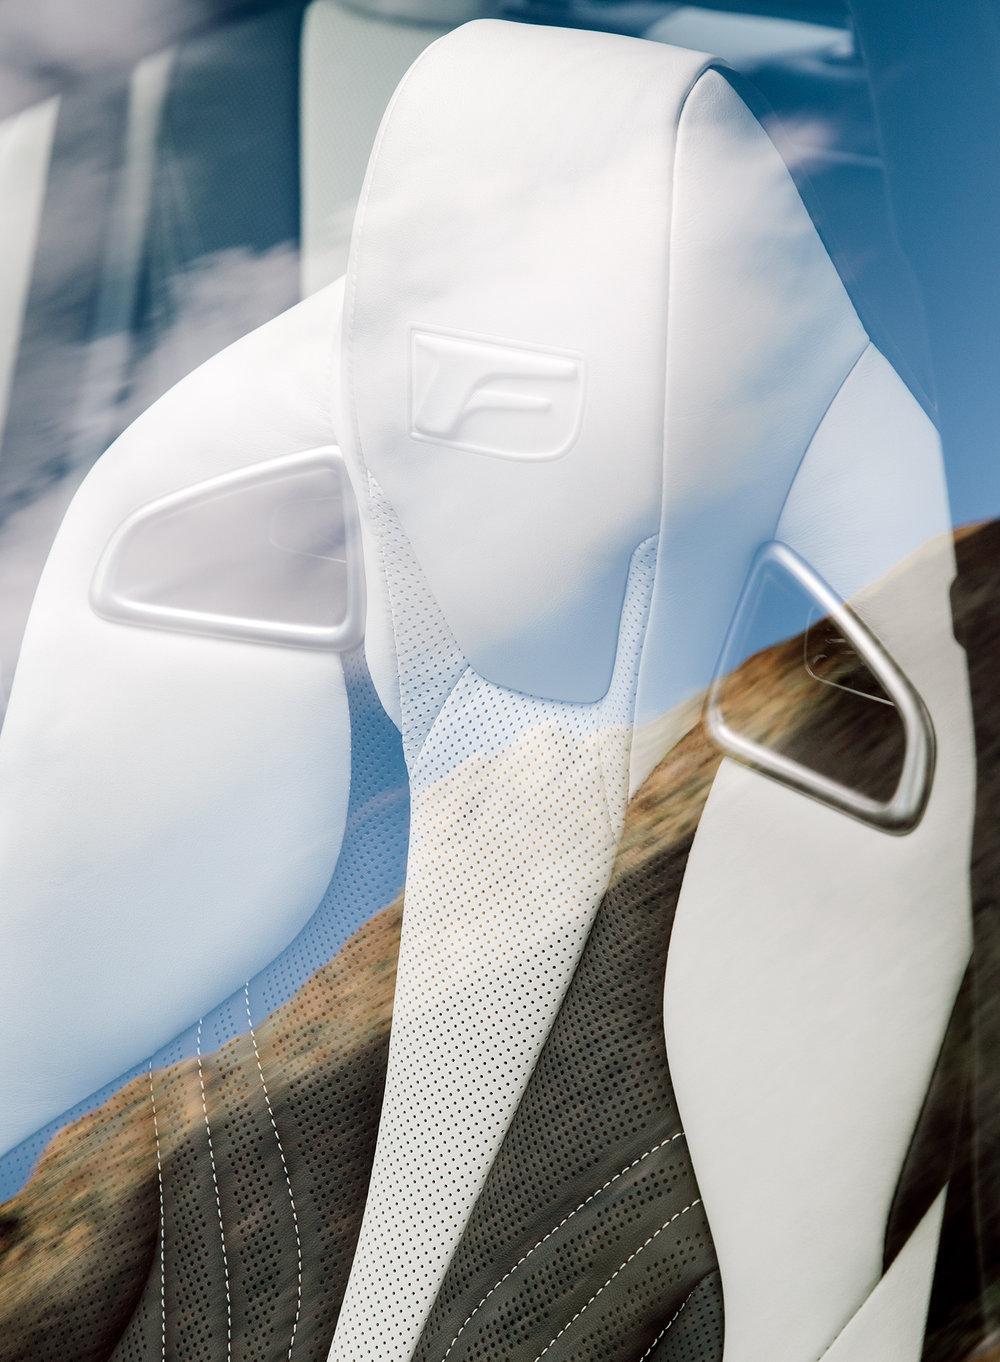 Lexus_Reveal_Details_FrontSeat_004.jpg